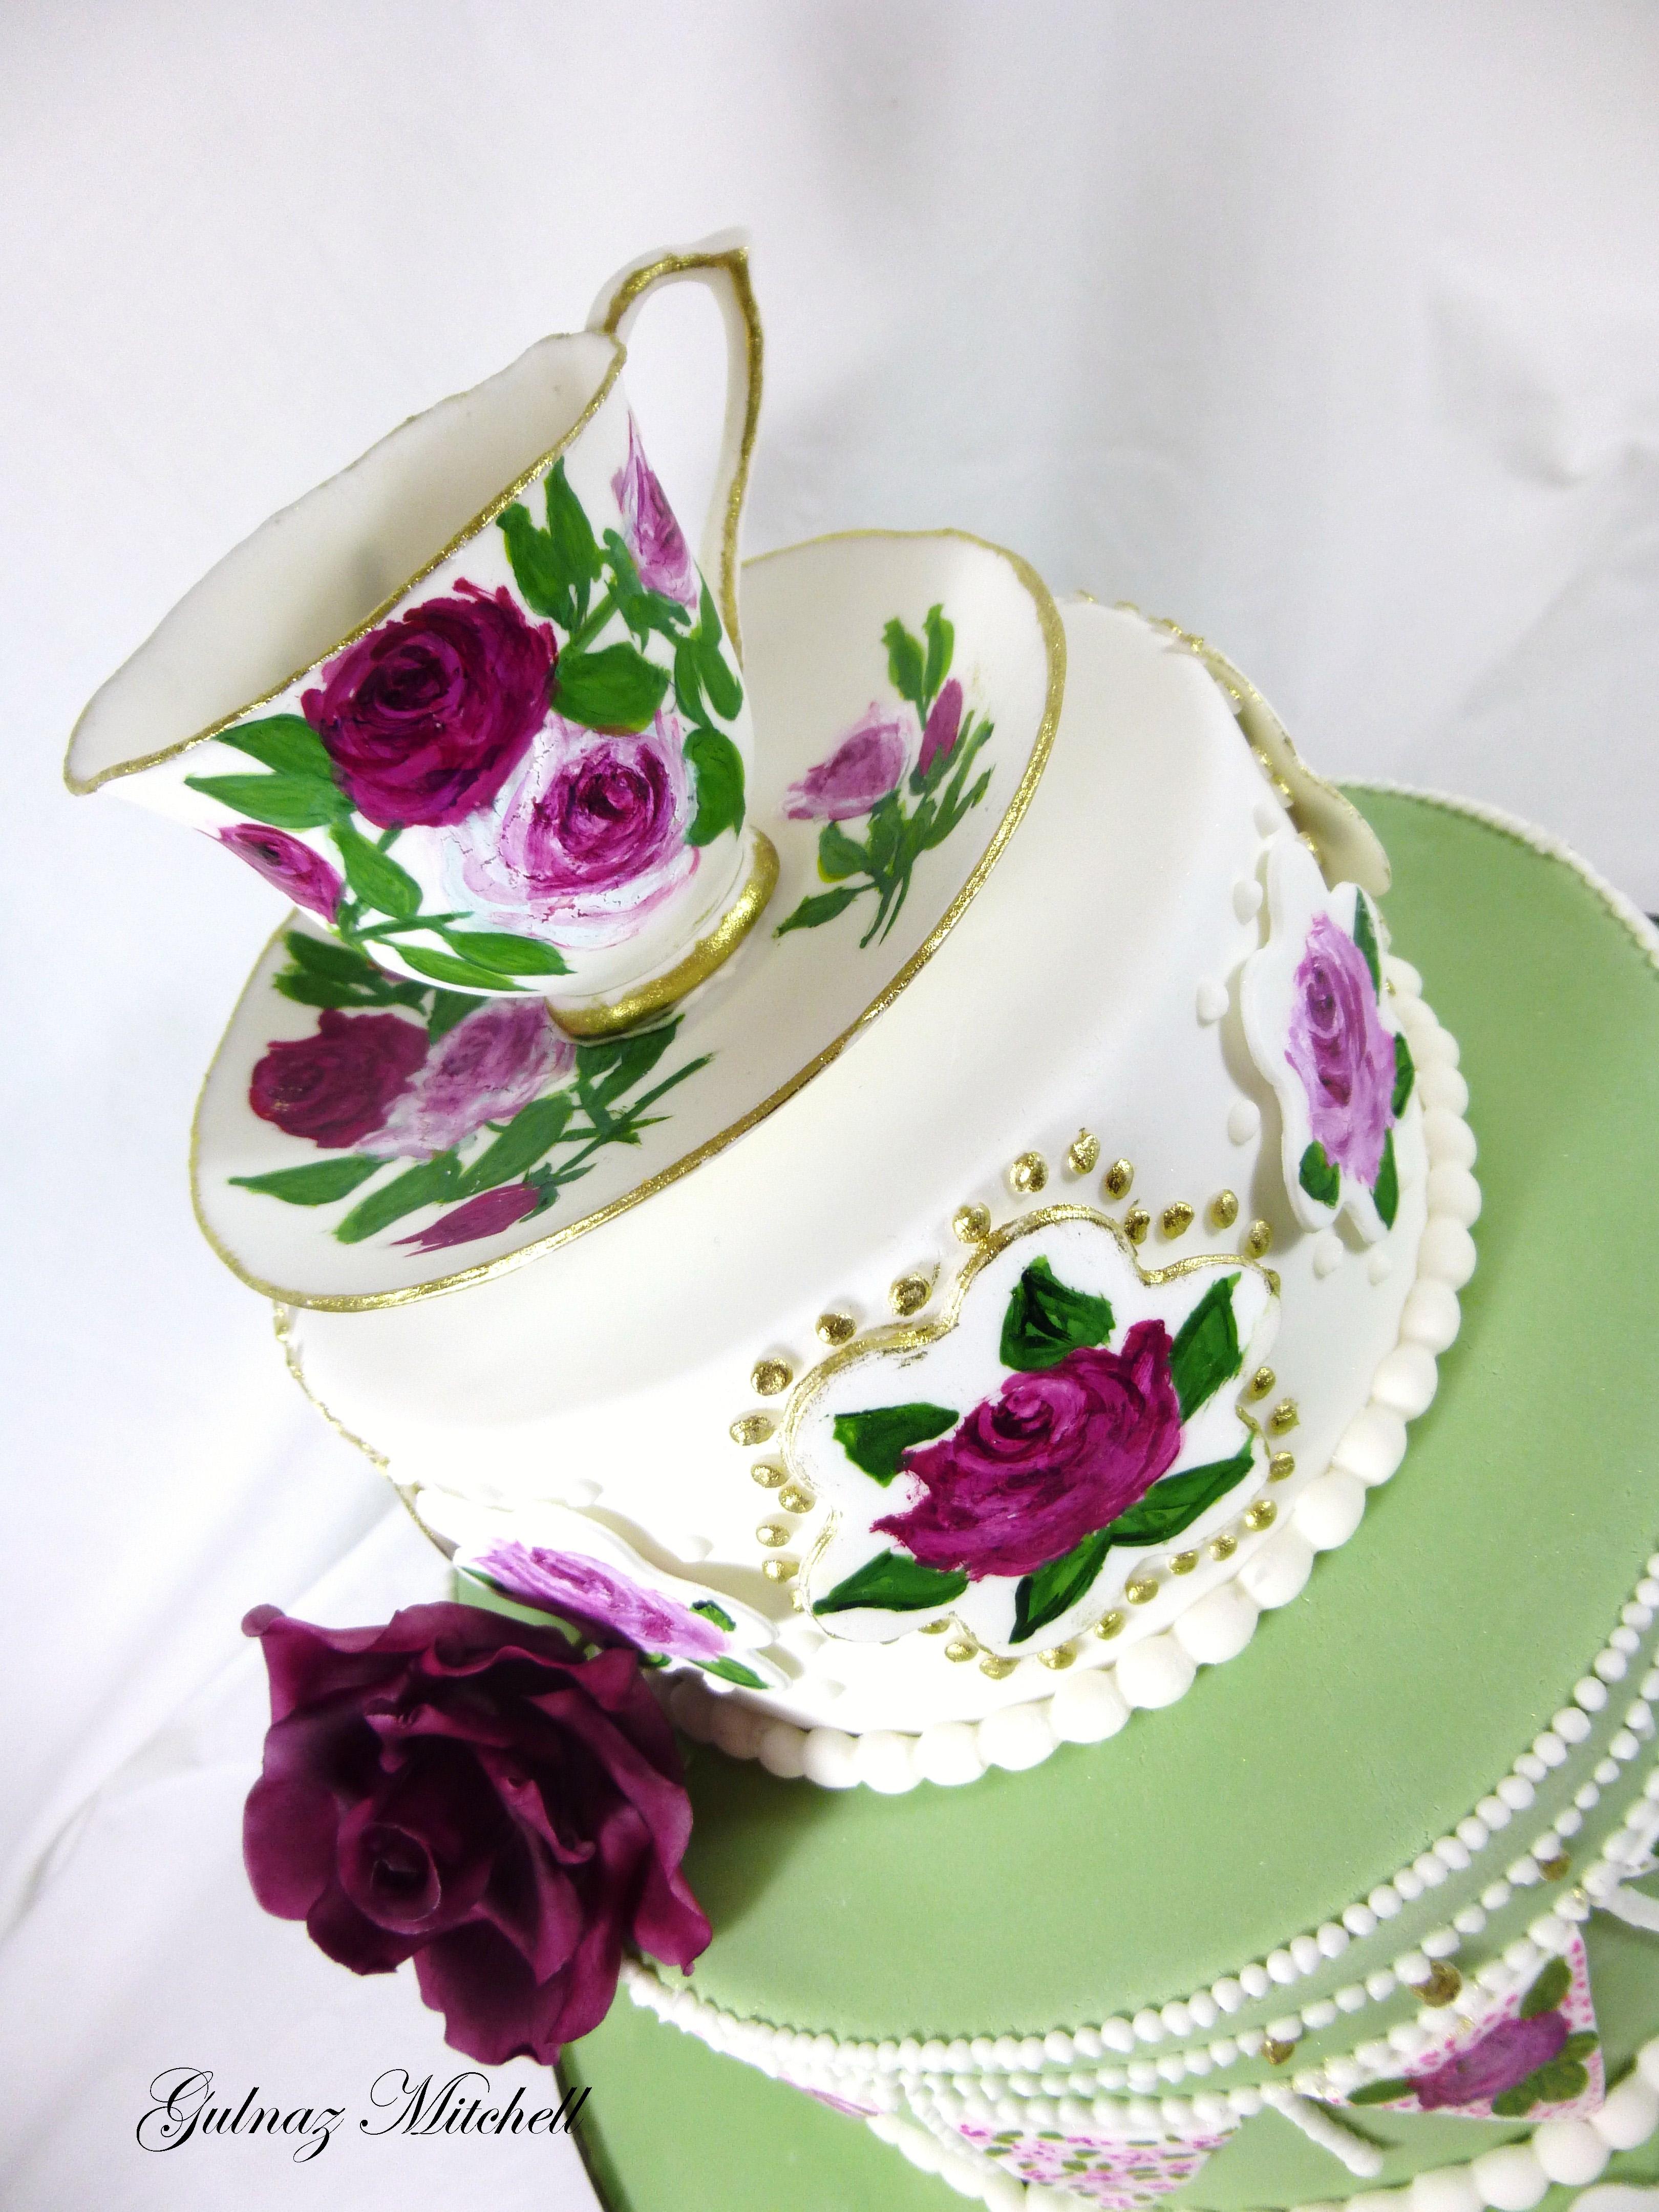 Free Hand Painted English High Tea Theme Cake With Hand